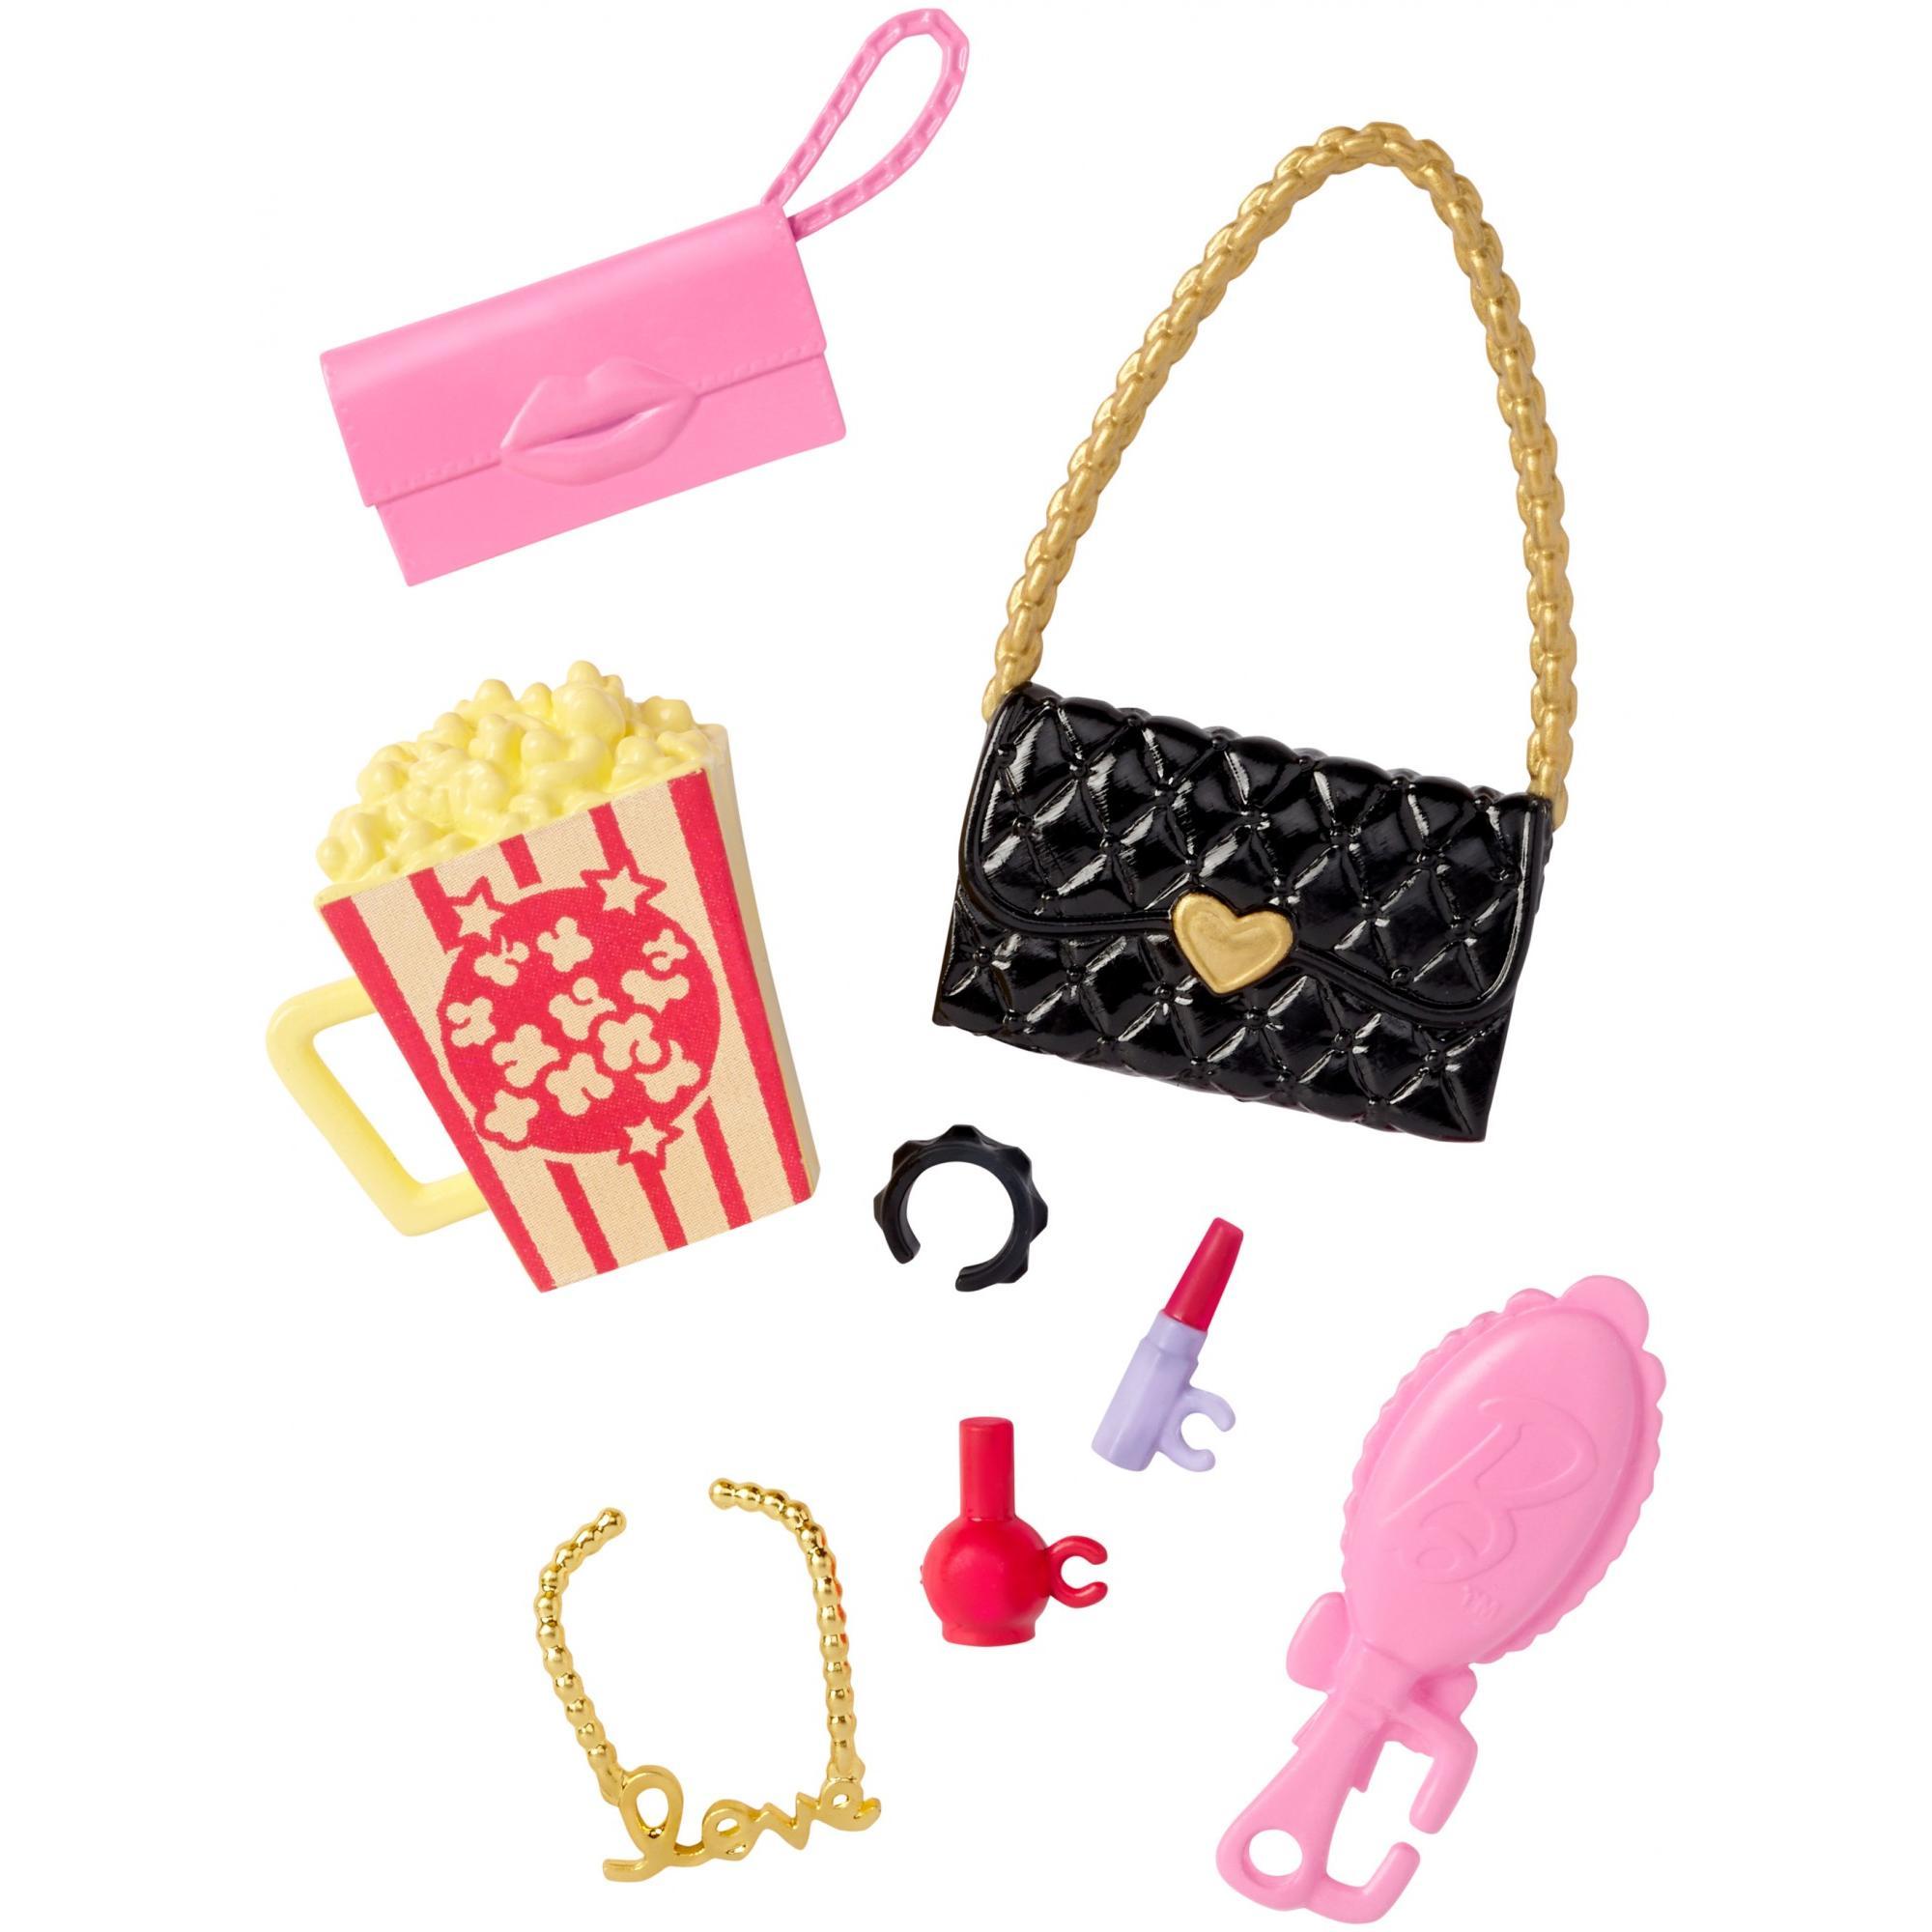 Barbie Accessory Pack - Love